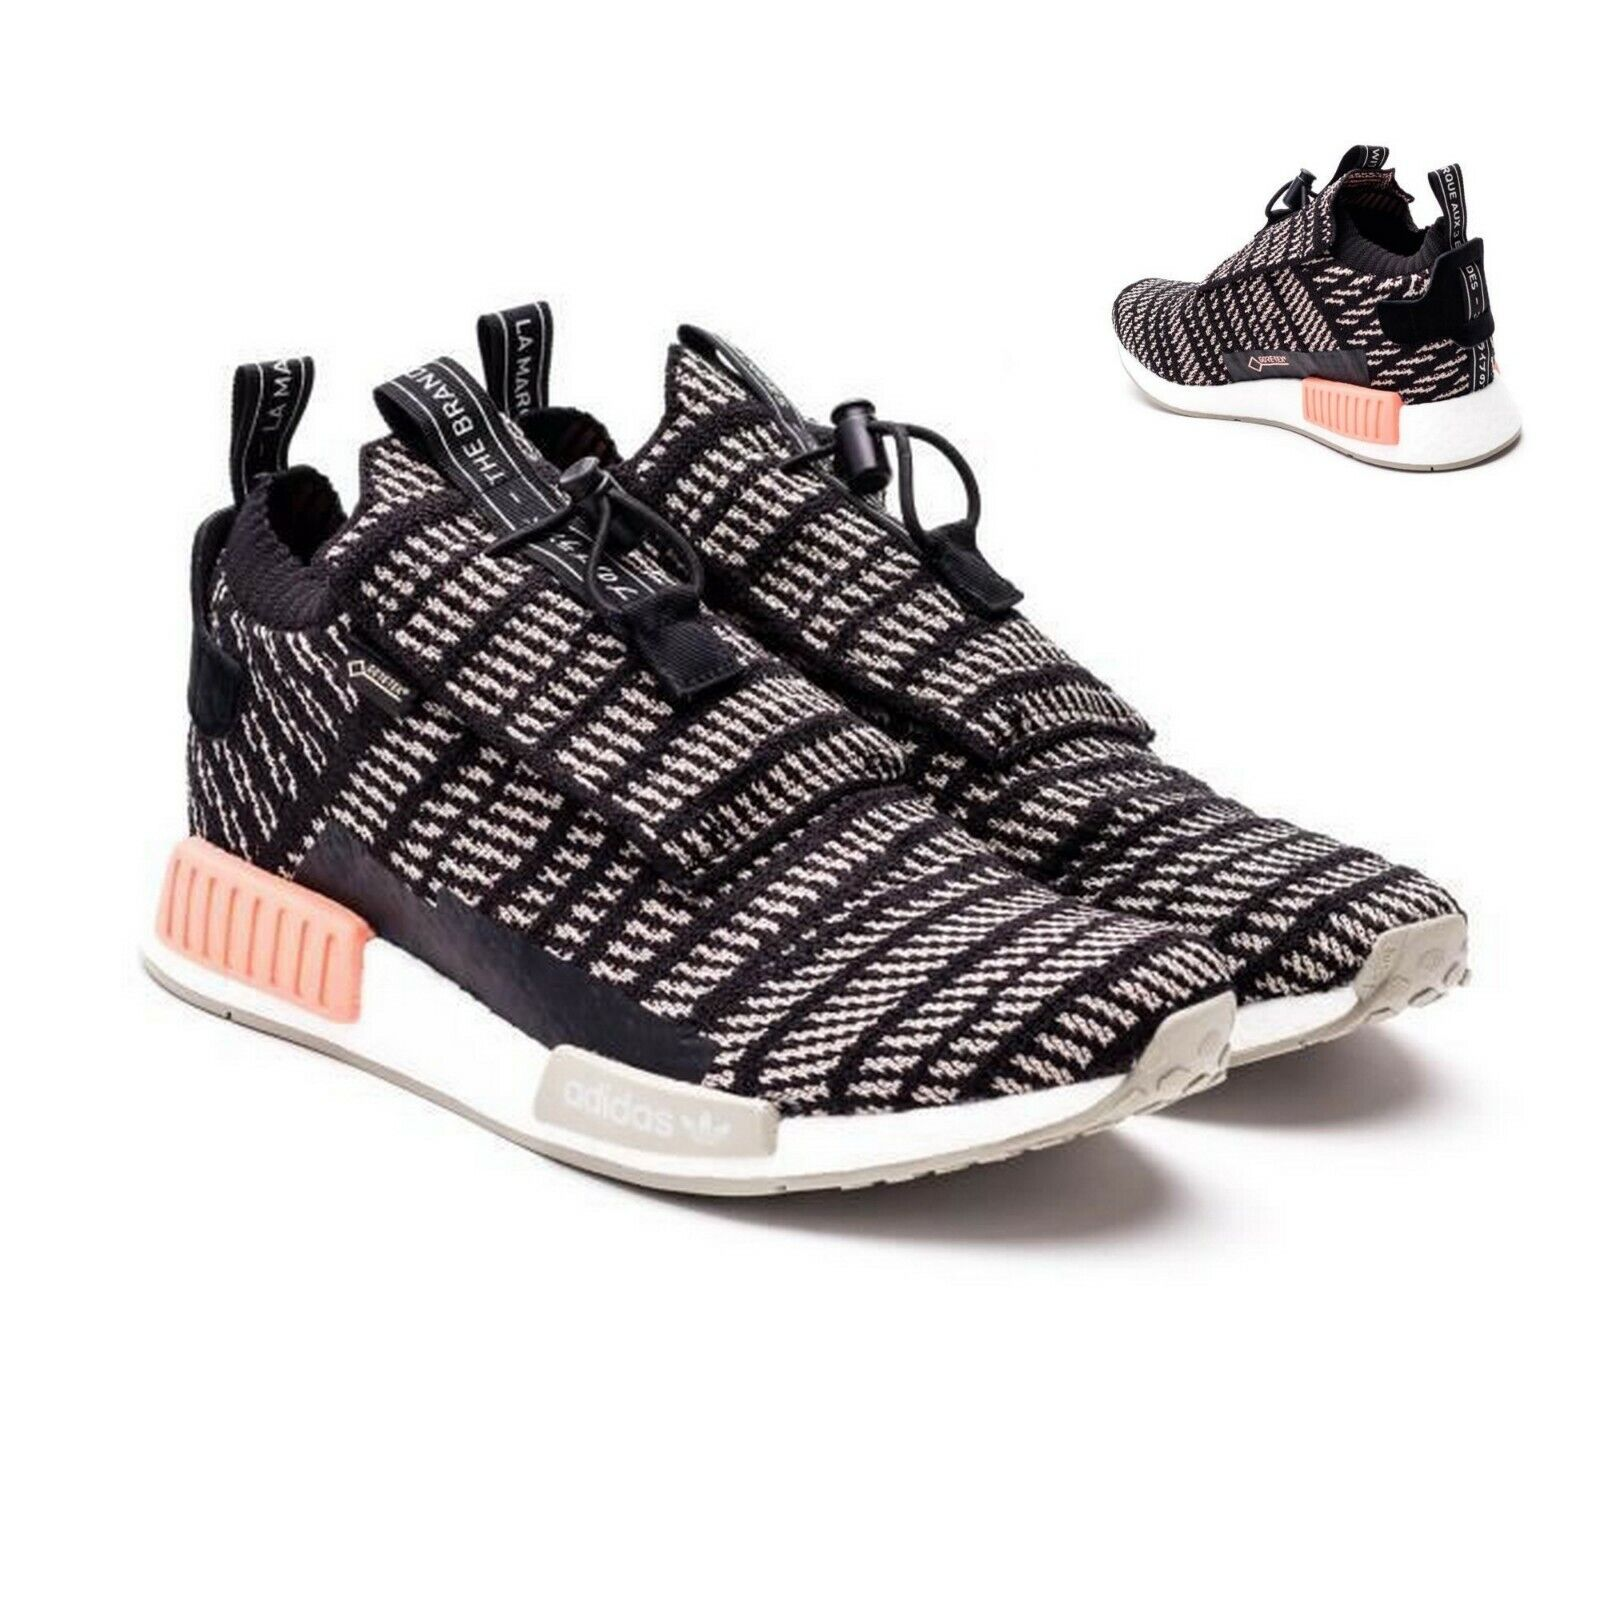 adidas NMD TS1 GTX GORE TEX® PK Primeknit Sneaker Turnschuhe Freizeit BB9176